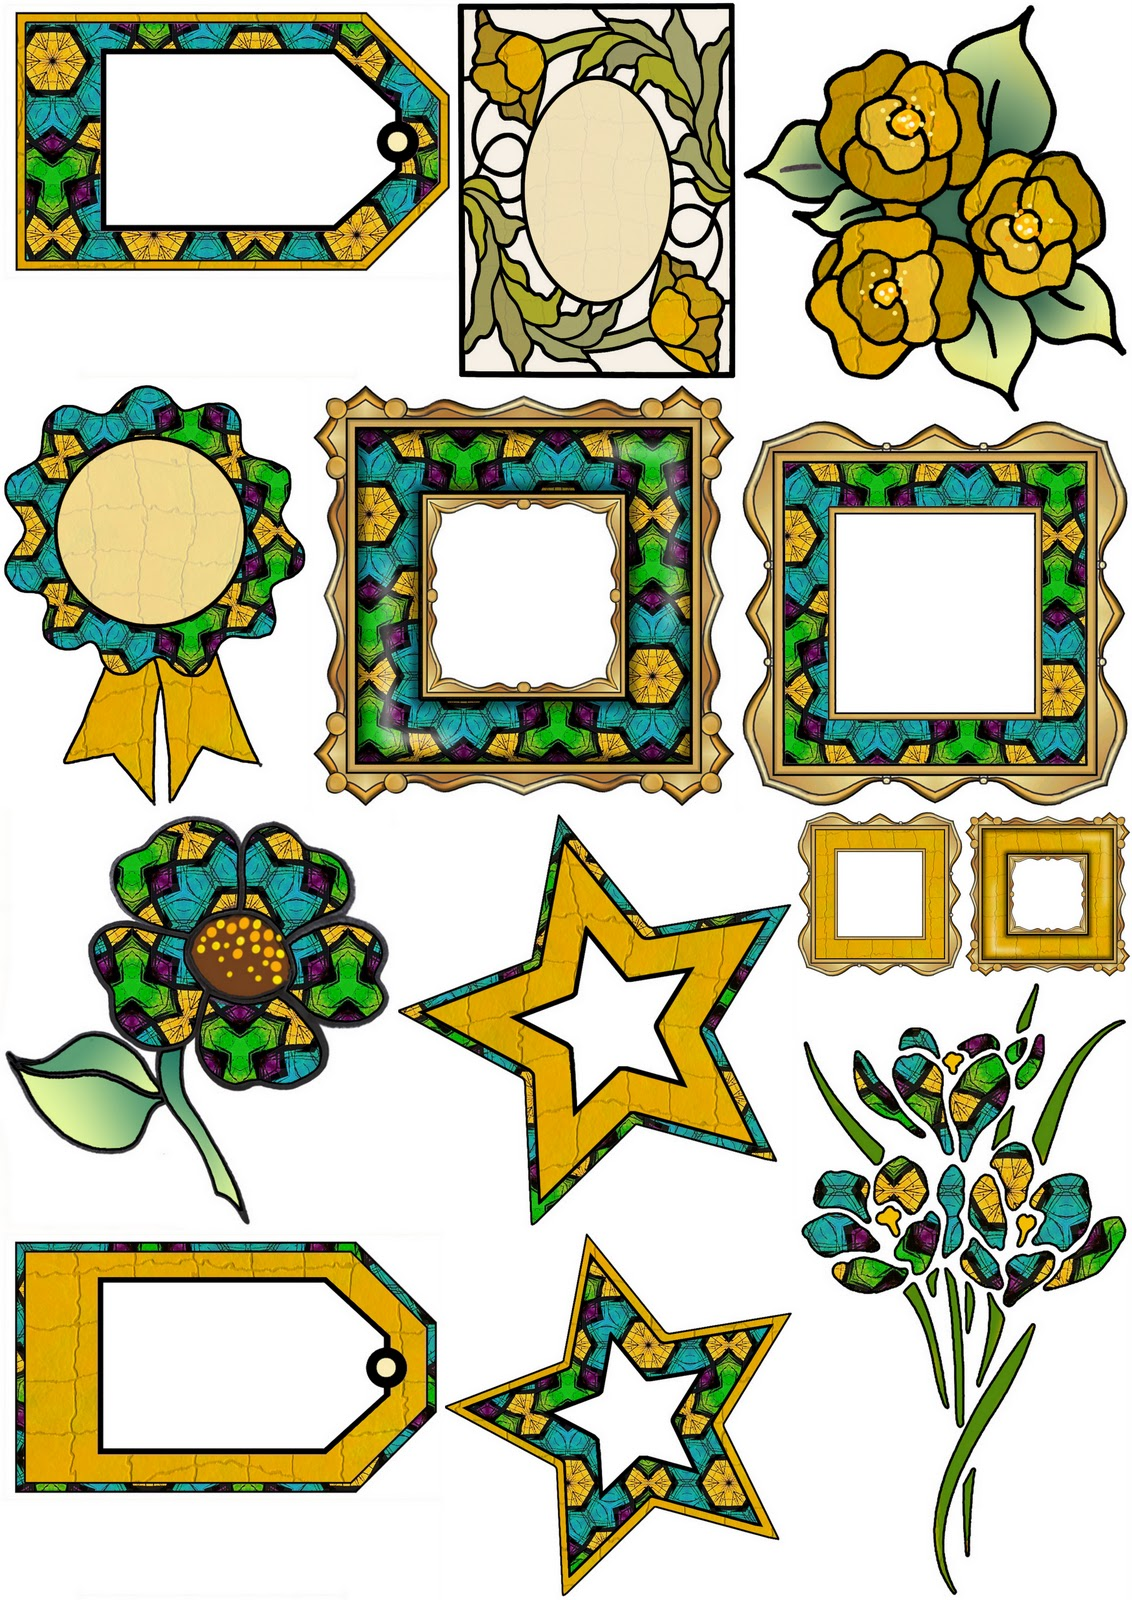 Camouflage Border Clip Art free image.